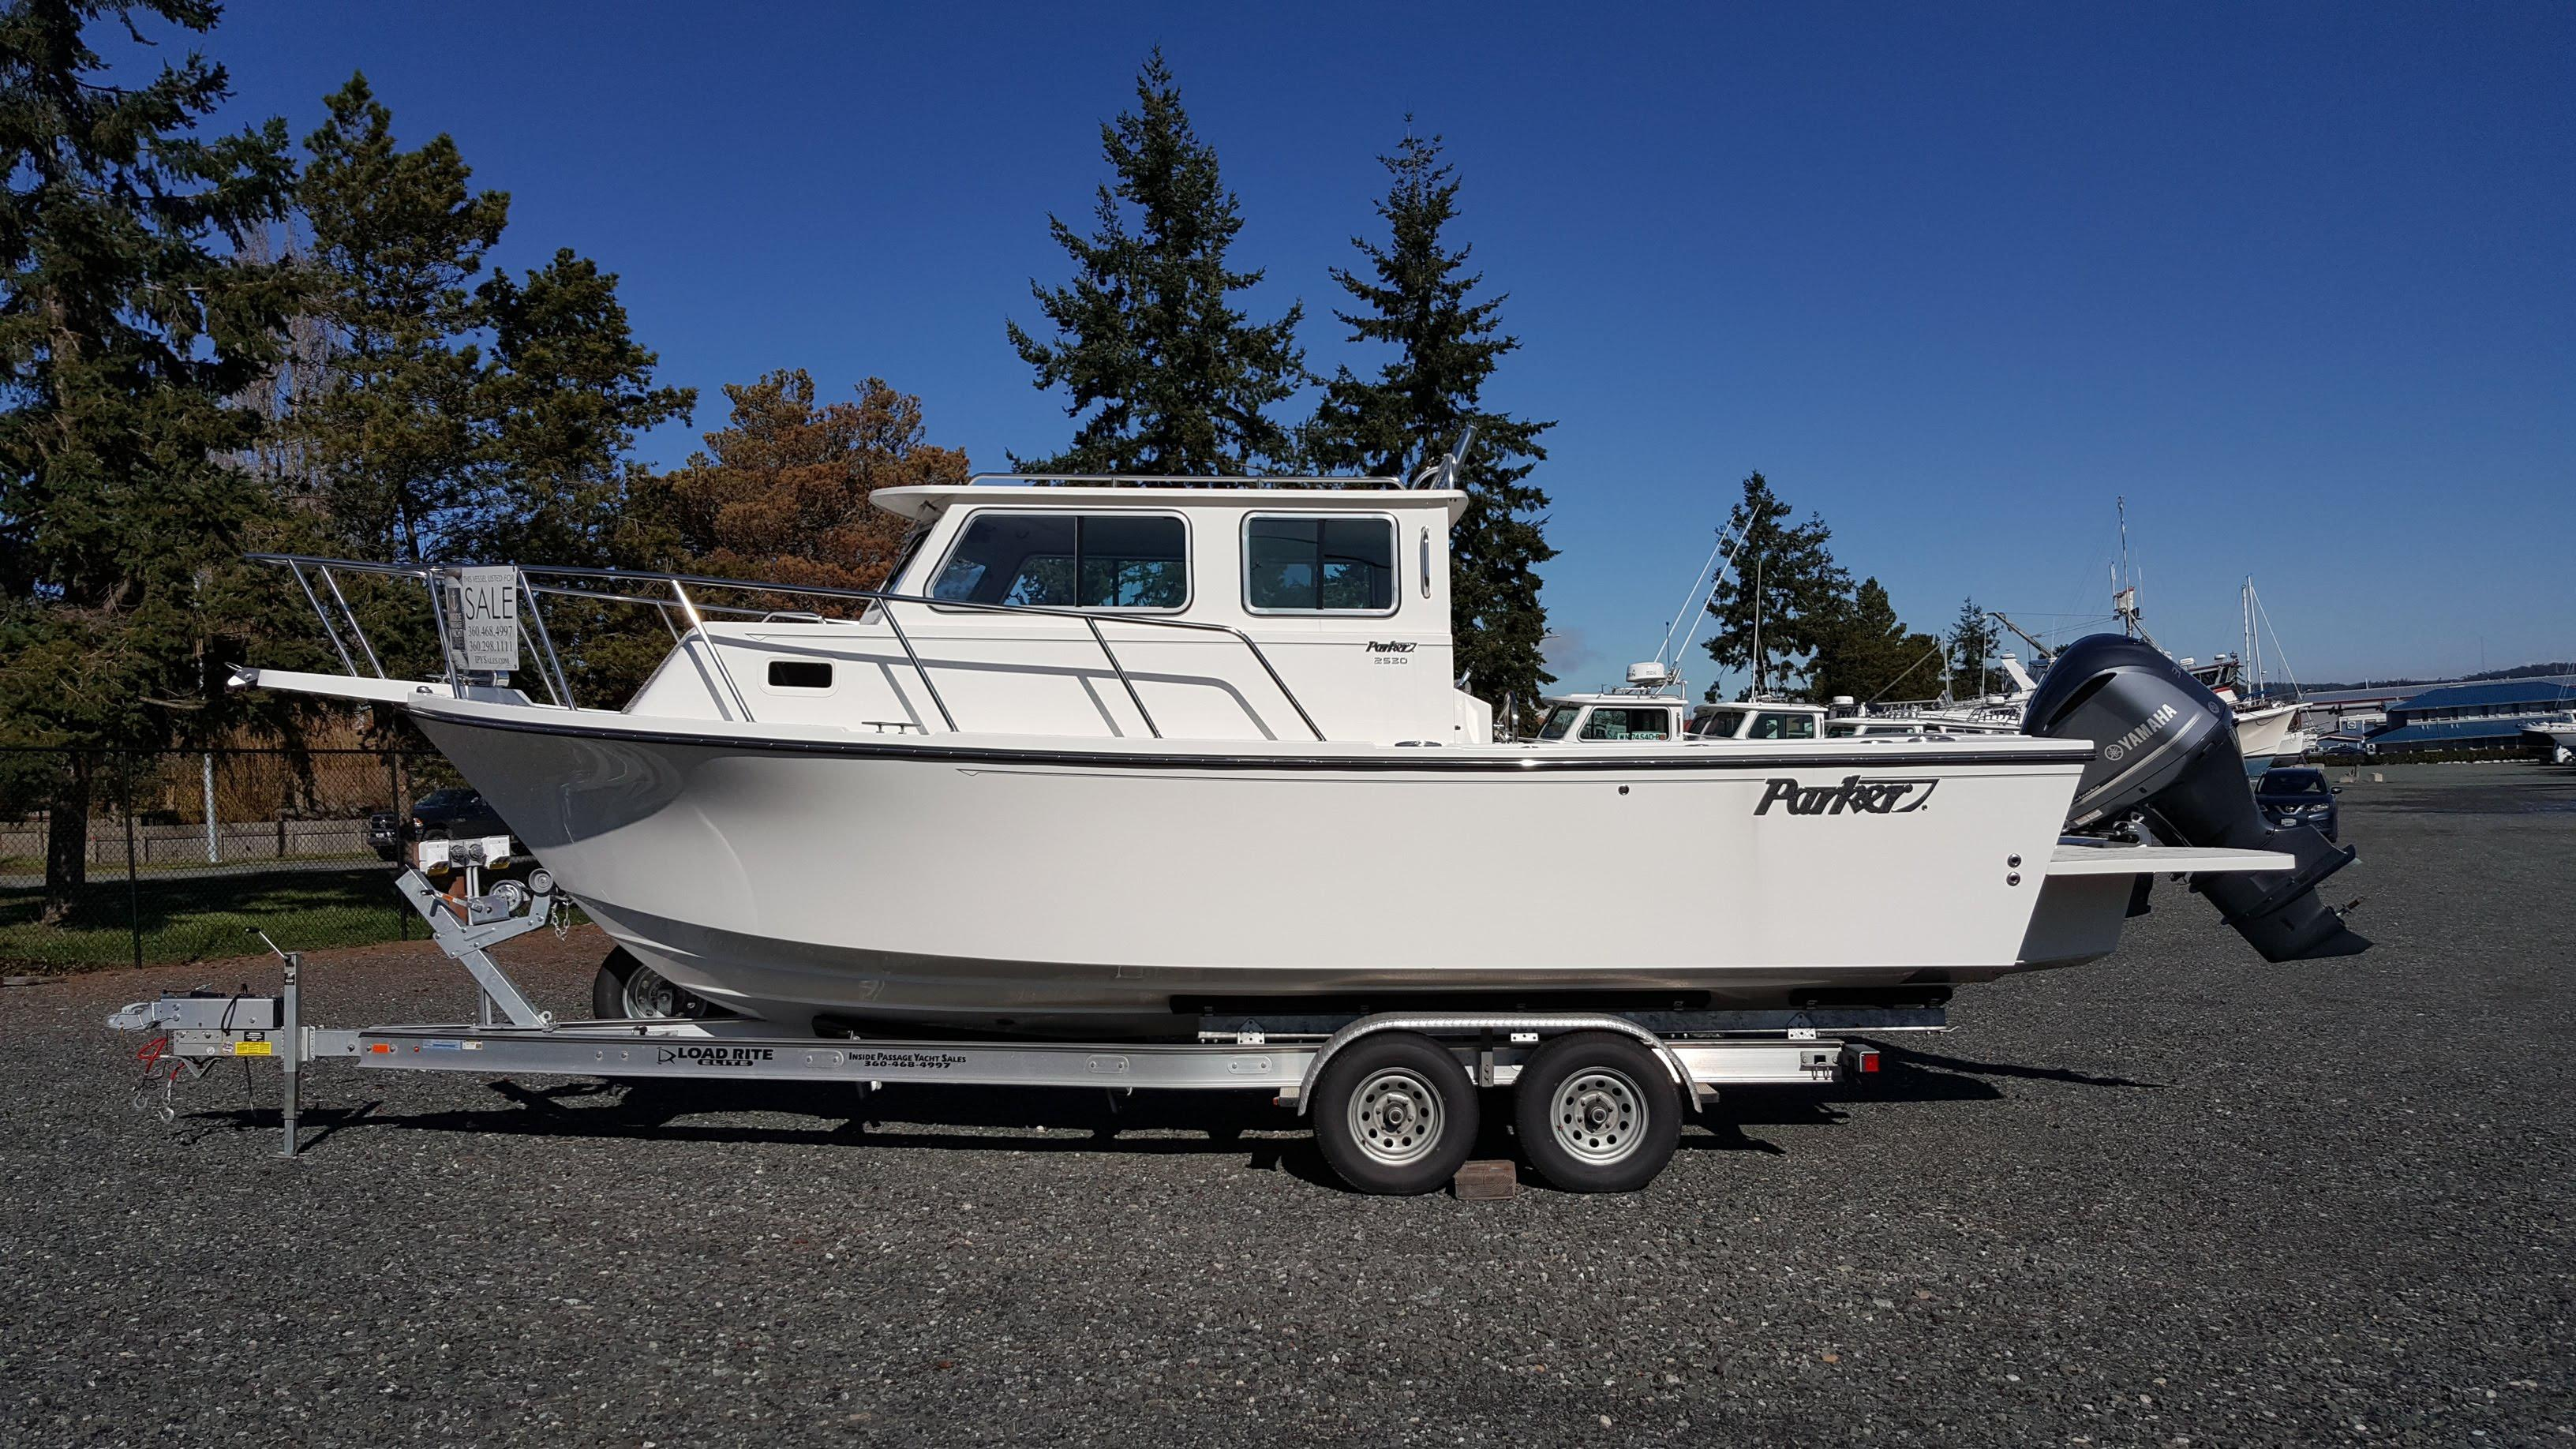 2018 Parker 2530 Extended Sport Cabin Power Boat For Sale